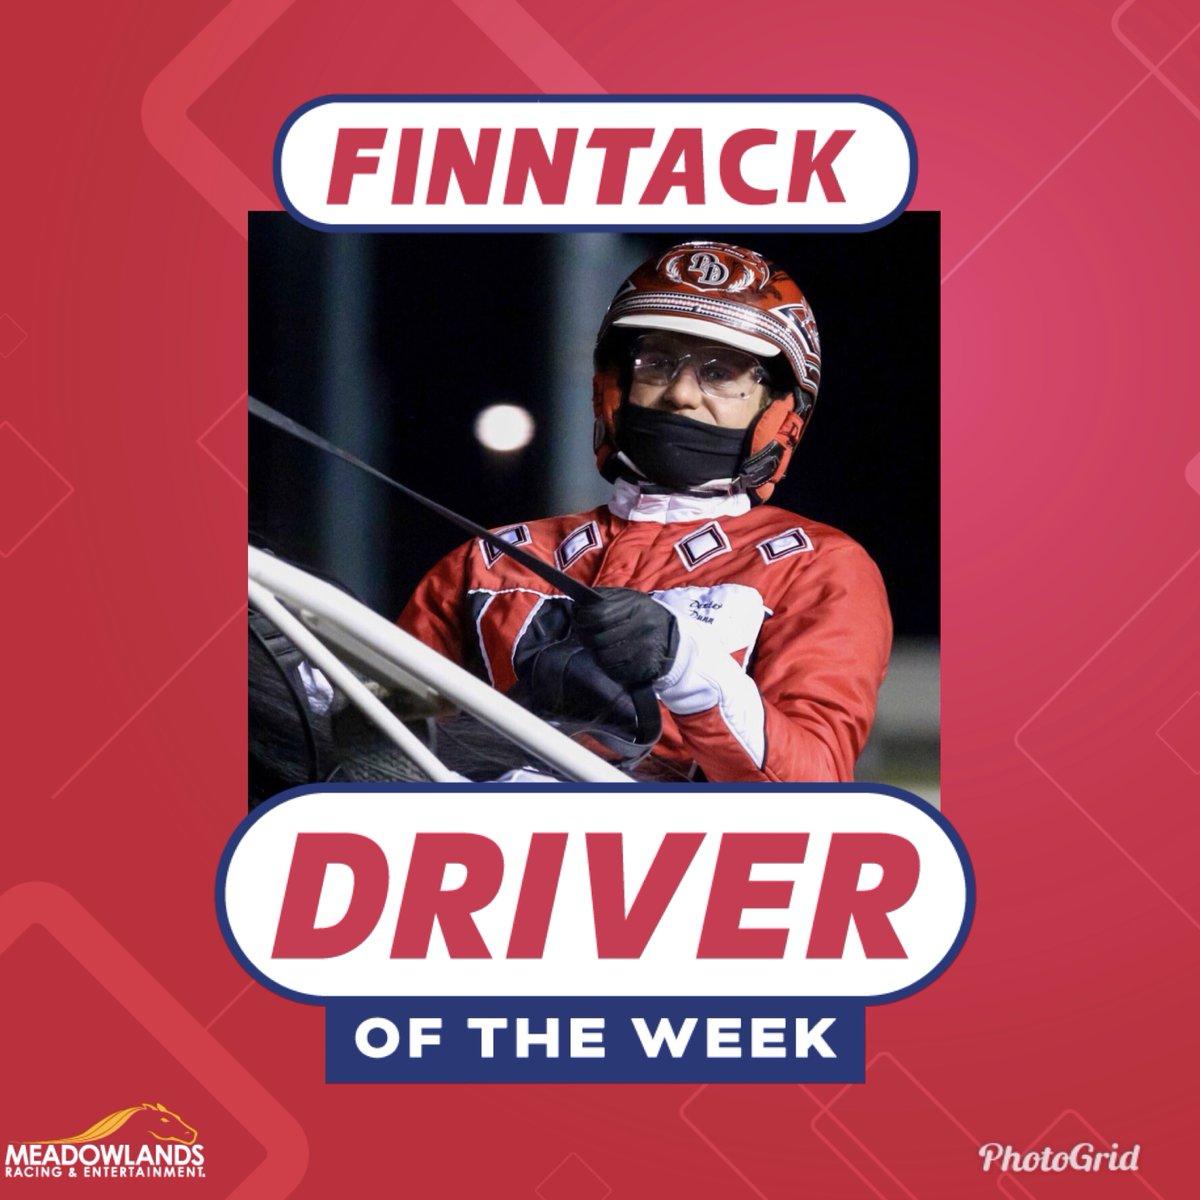 Finn Tack Driver of the Week  @FinnTack  @dexterdunn1  🔸26: 9-2-5 .453 last week 🔹Friday Fiver + Saturday Grandslam 🔸Nominated for Driver of the Year  #DriverOfTheWeek #HarnessRacing #PlayBigM